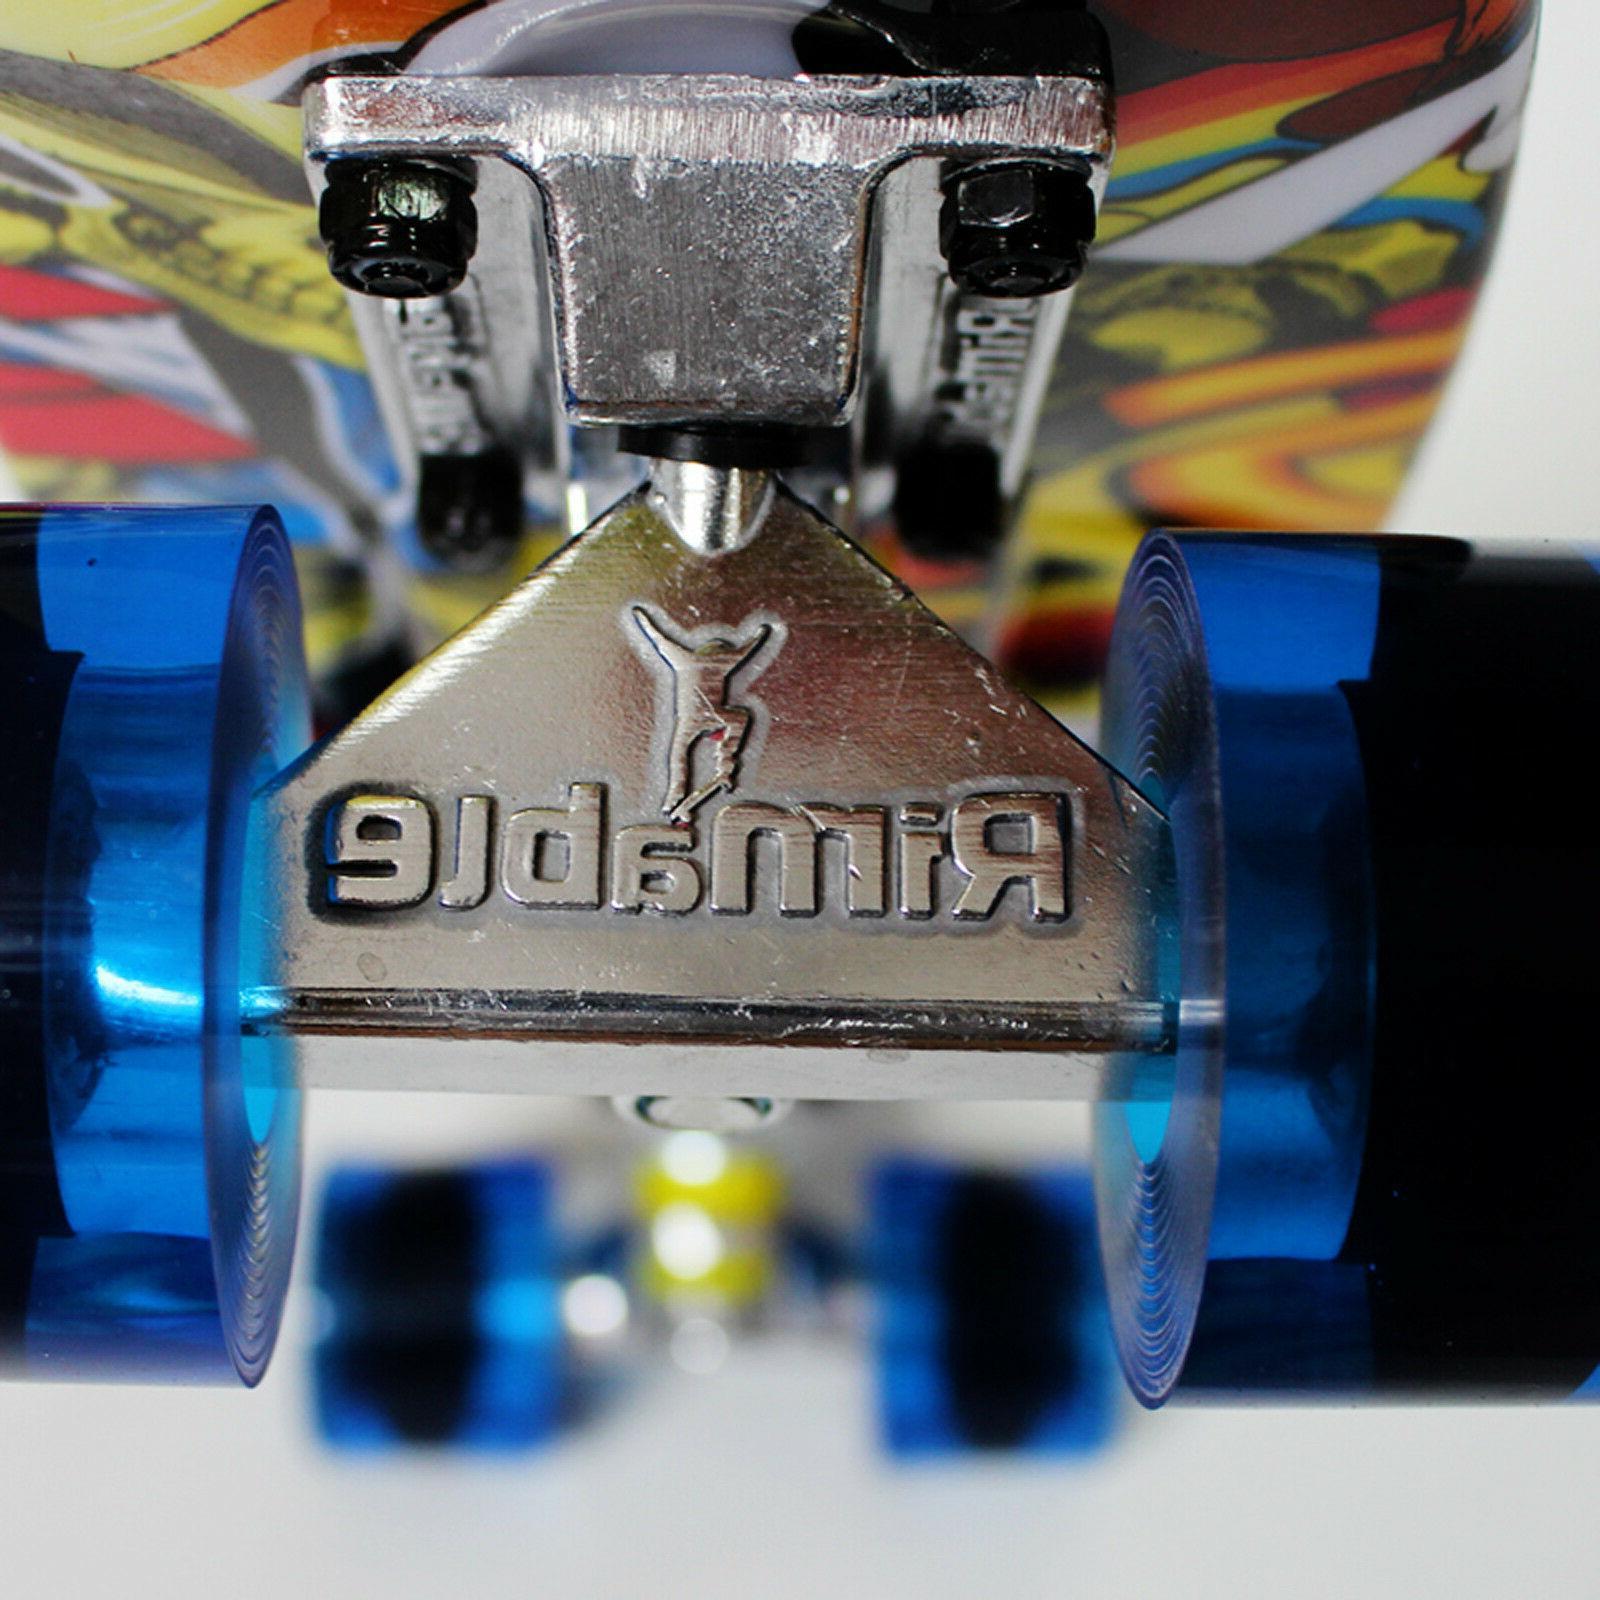 "Rimable 22"" Cruiser Skateboard Graphic"